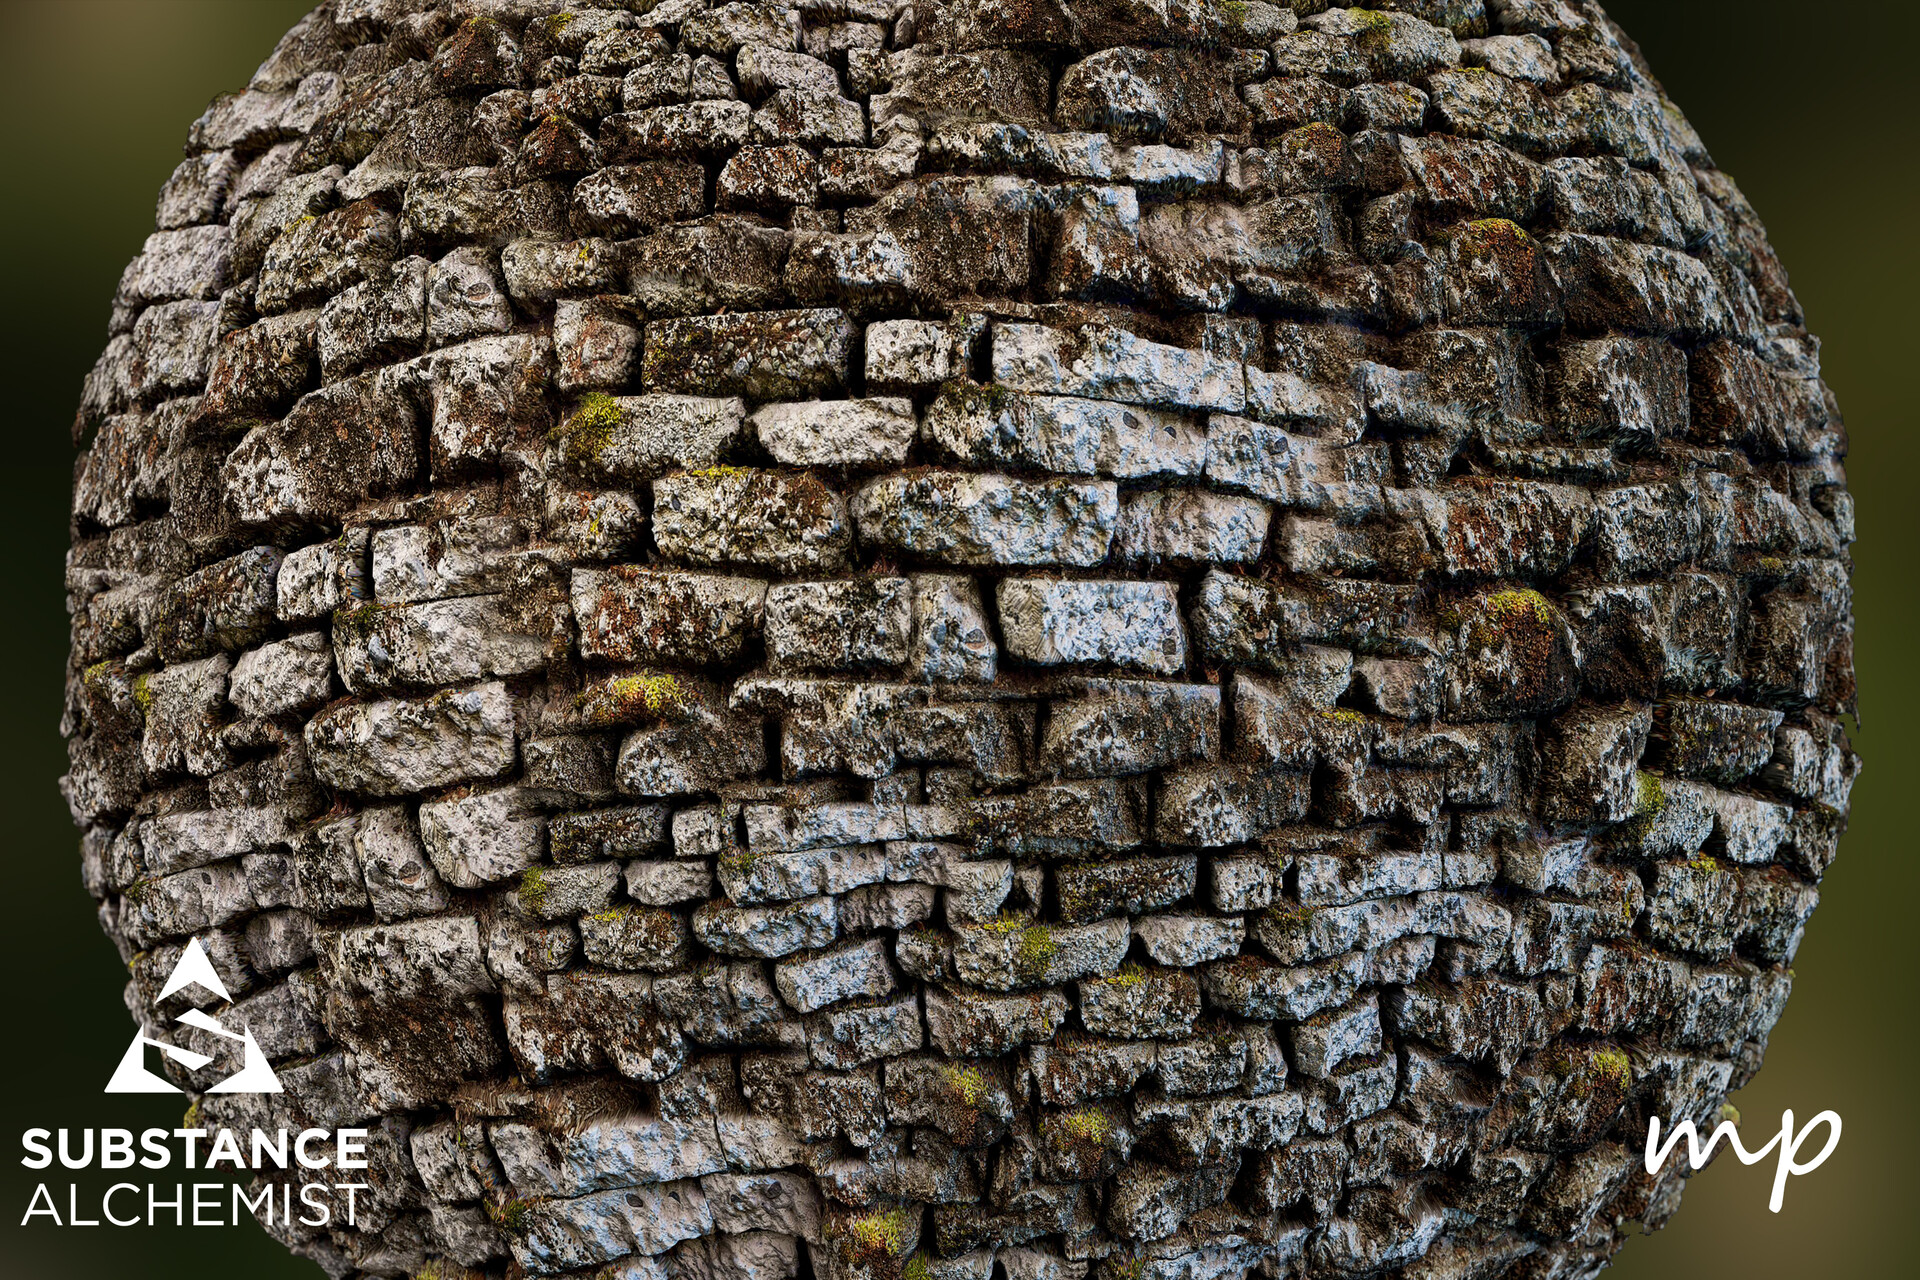 Martin pietras p30 rock wall 04